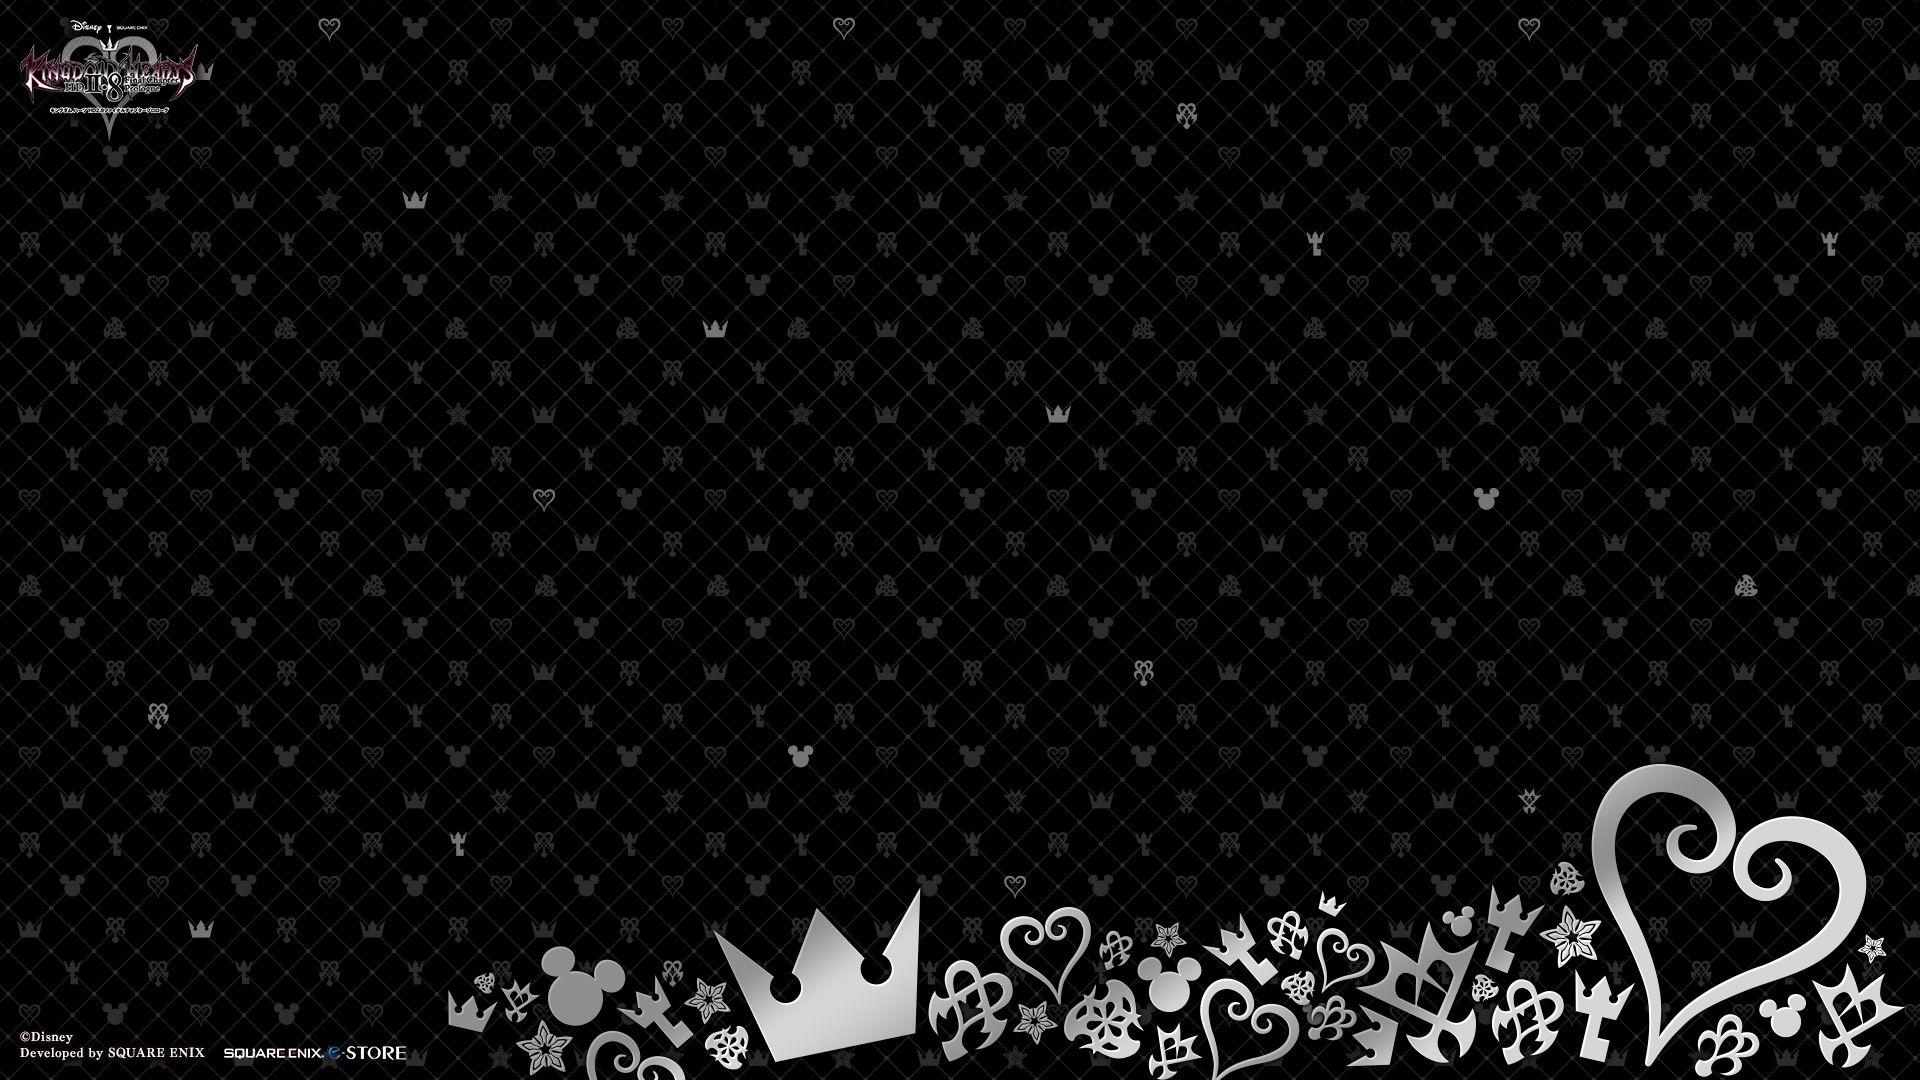 Pc 1920x1080 Jpg 1920 1080 Kingdom Hearts Wallpaper Heart Wallpaper Kingdom Hearts